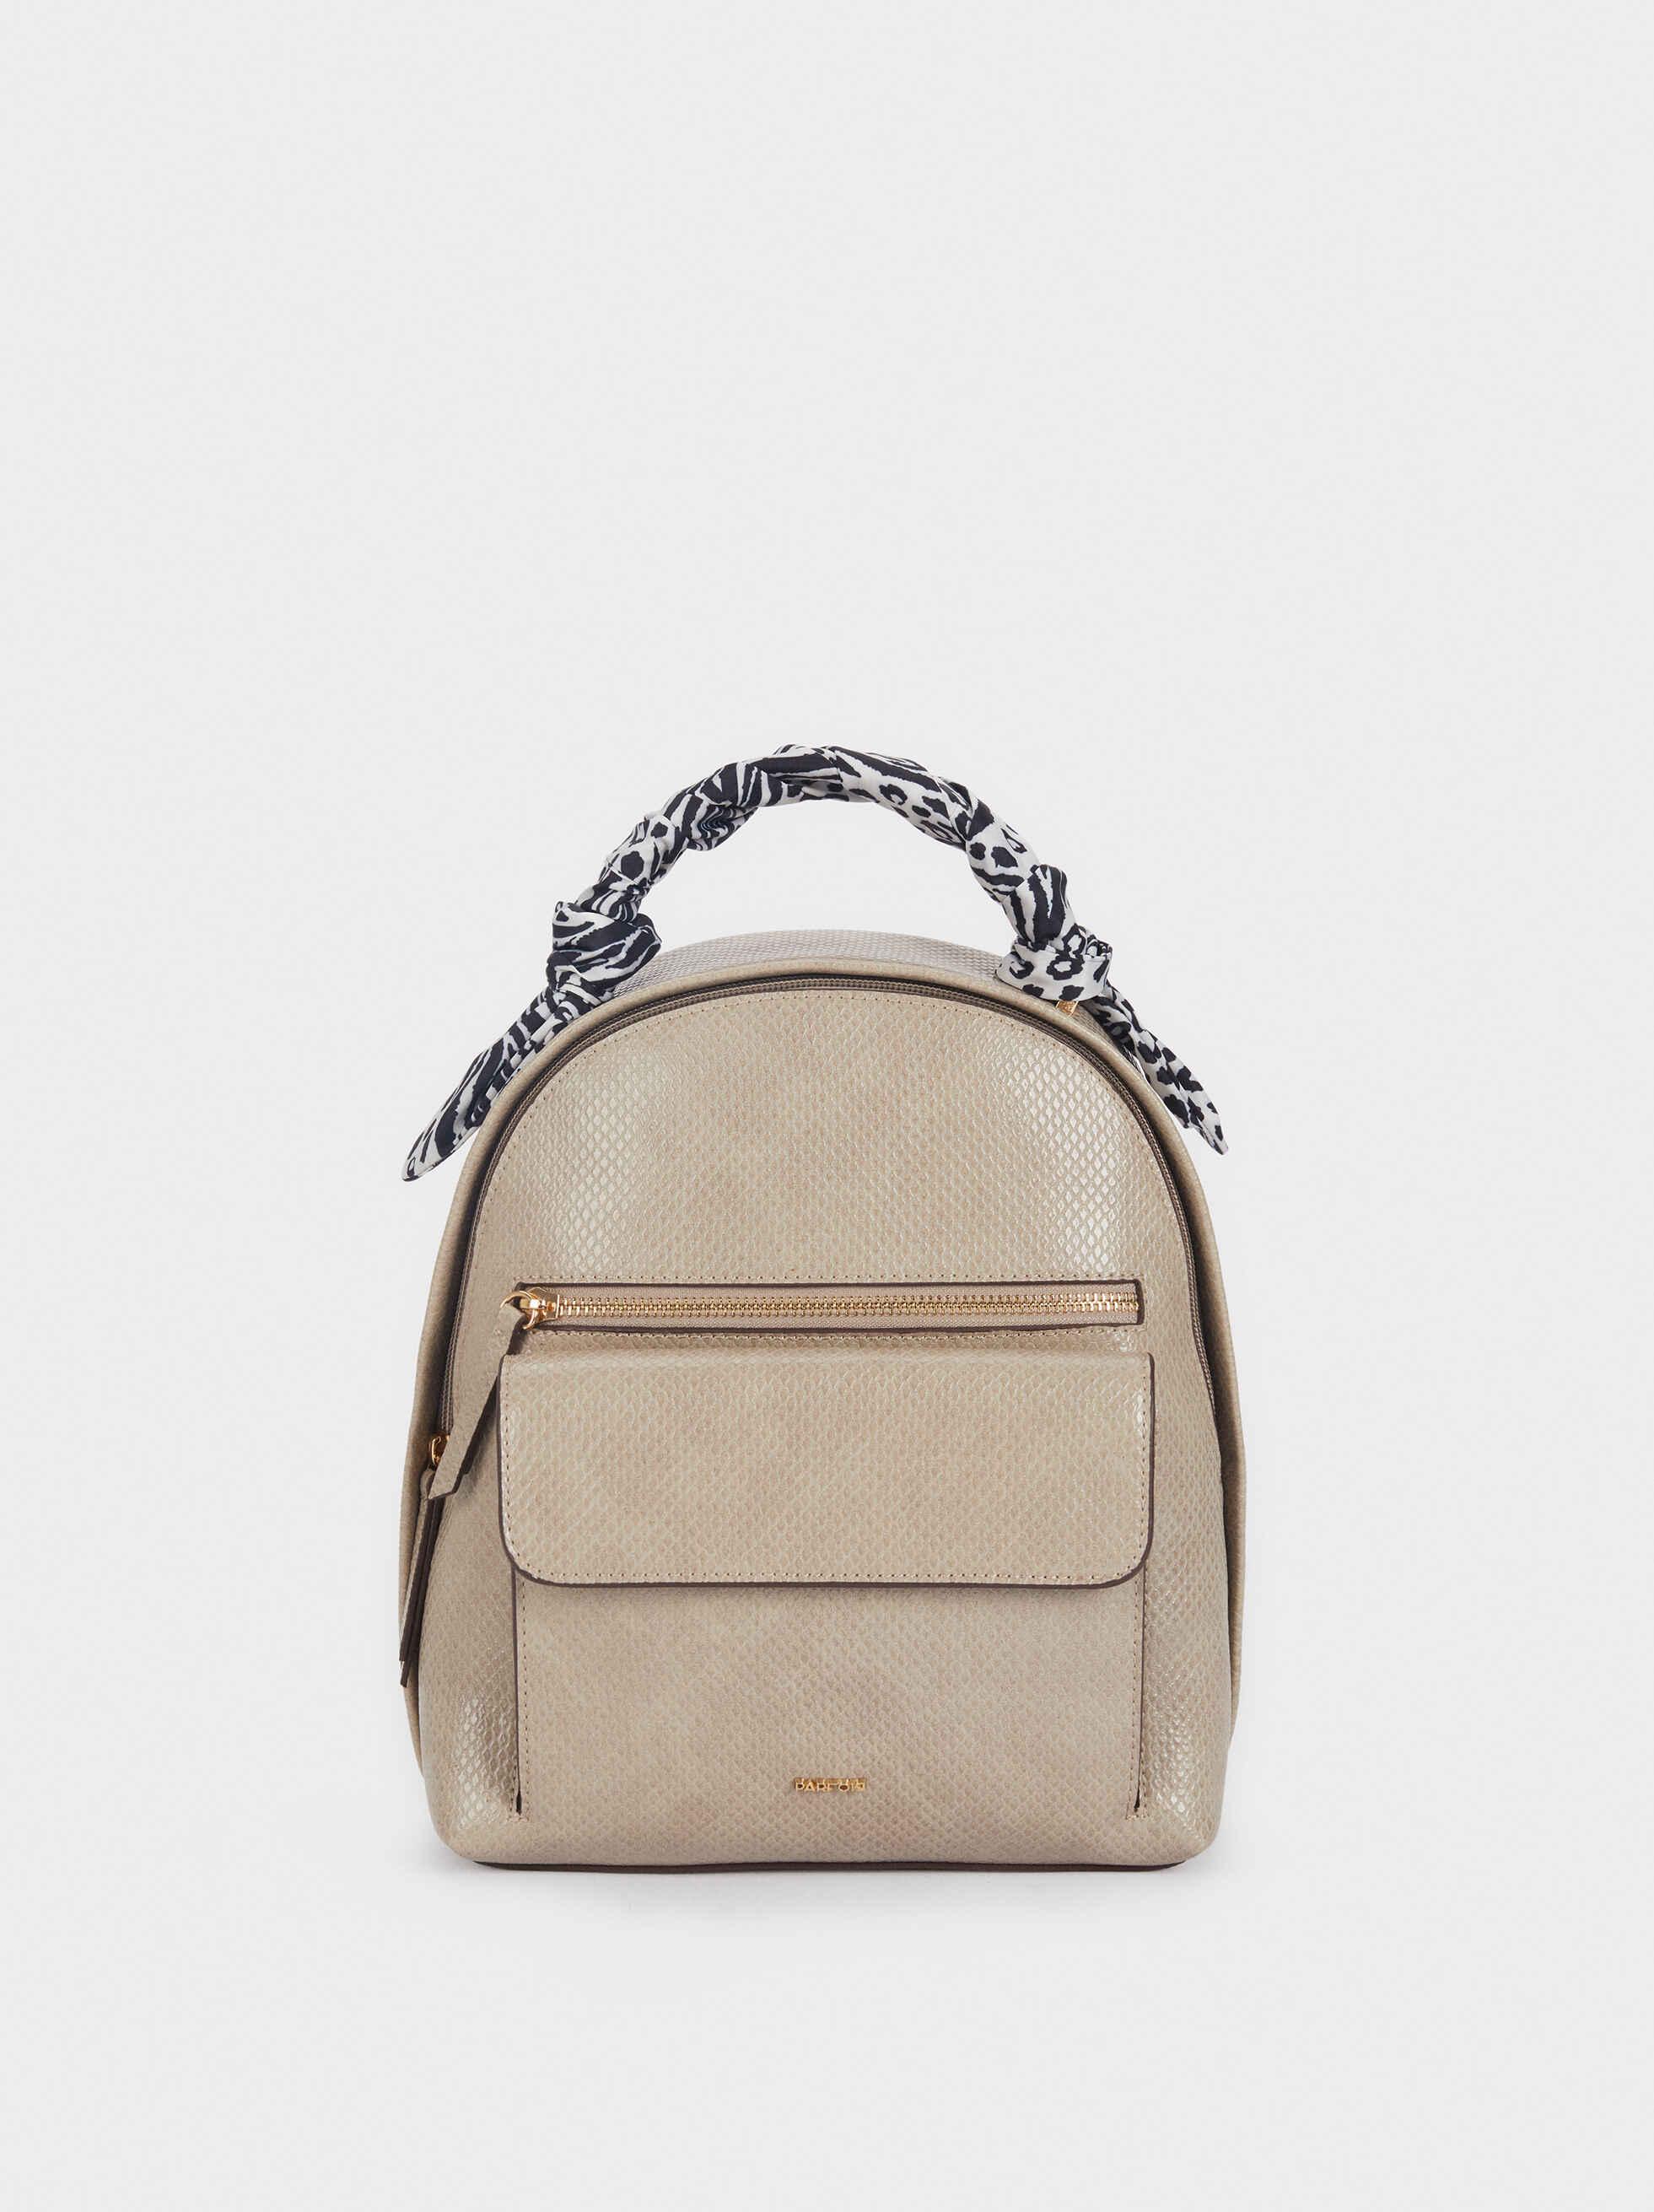 Backpack With Contrasting Printed Handle, Ecru, hi-res